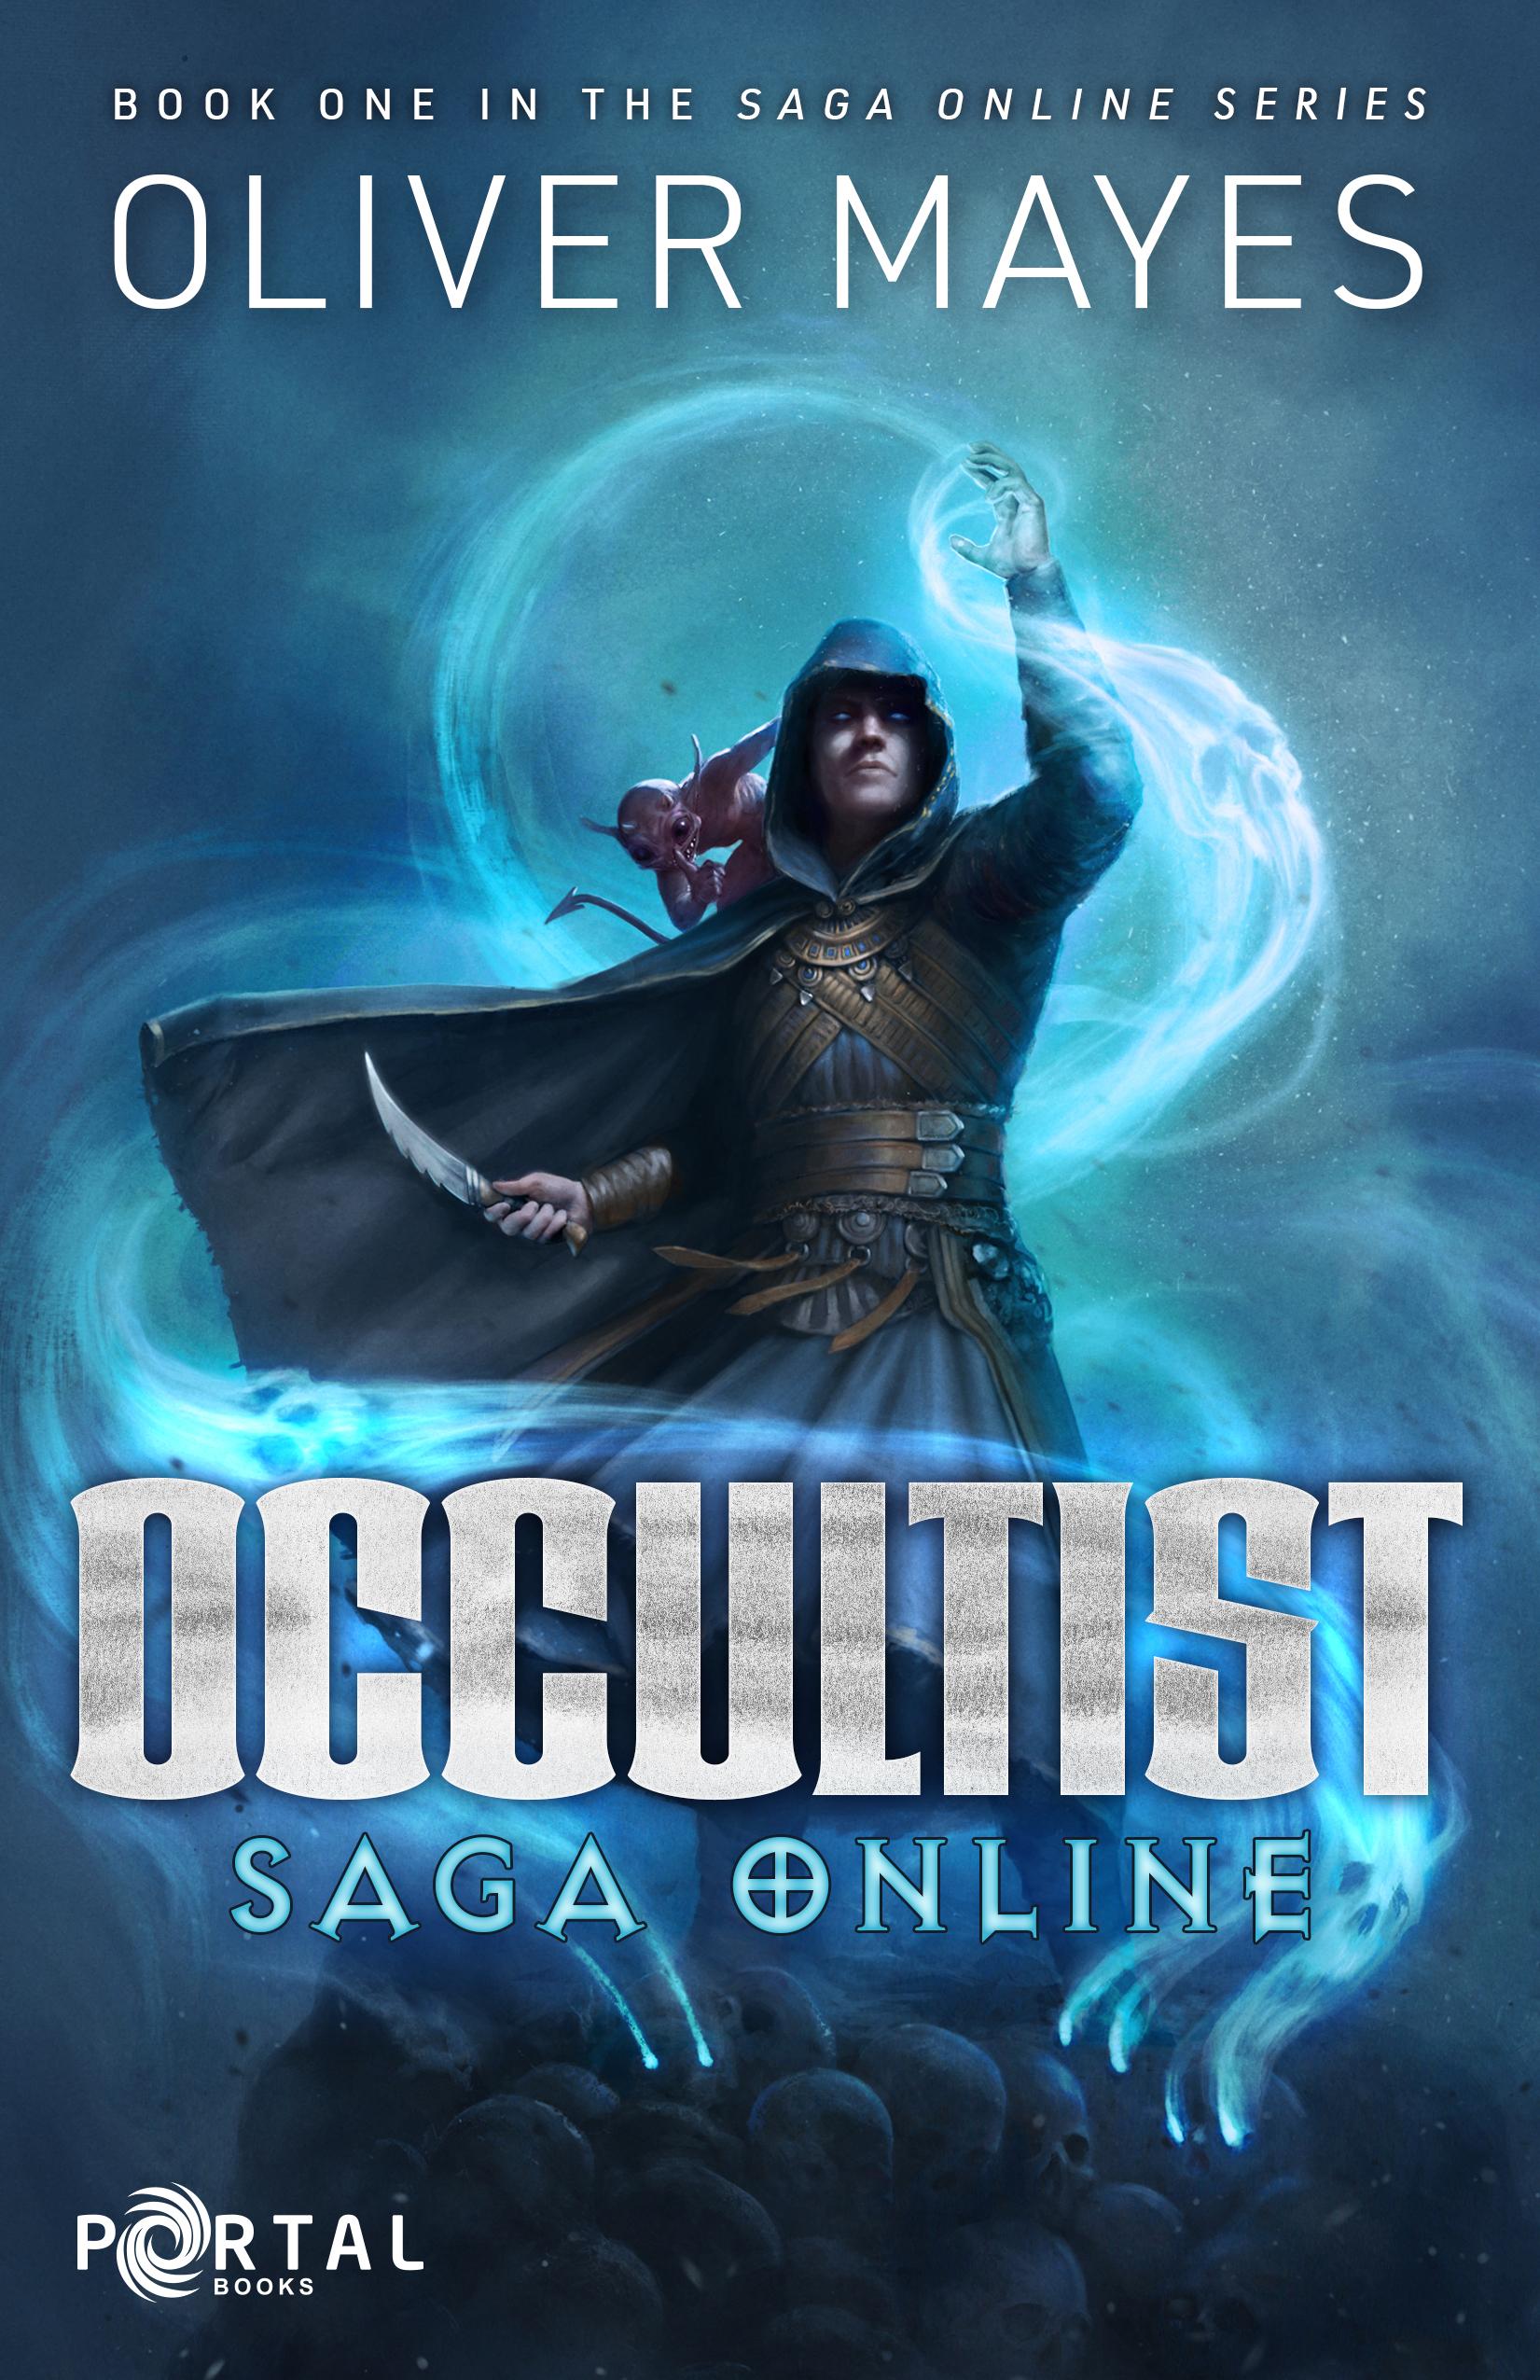 OCCULTIST BOOK COVER 2.jpg